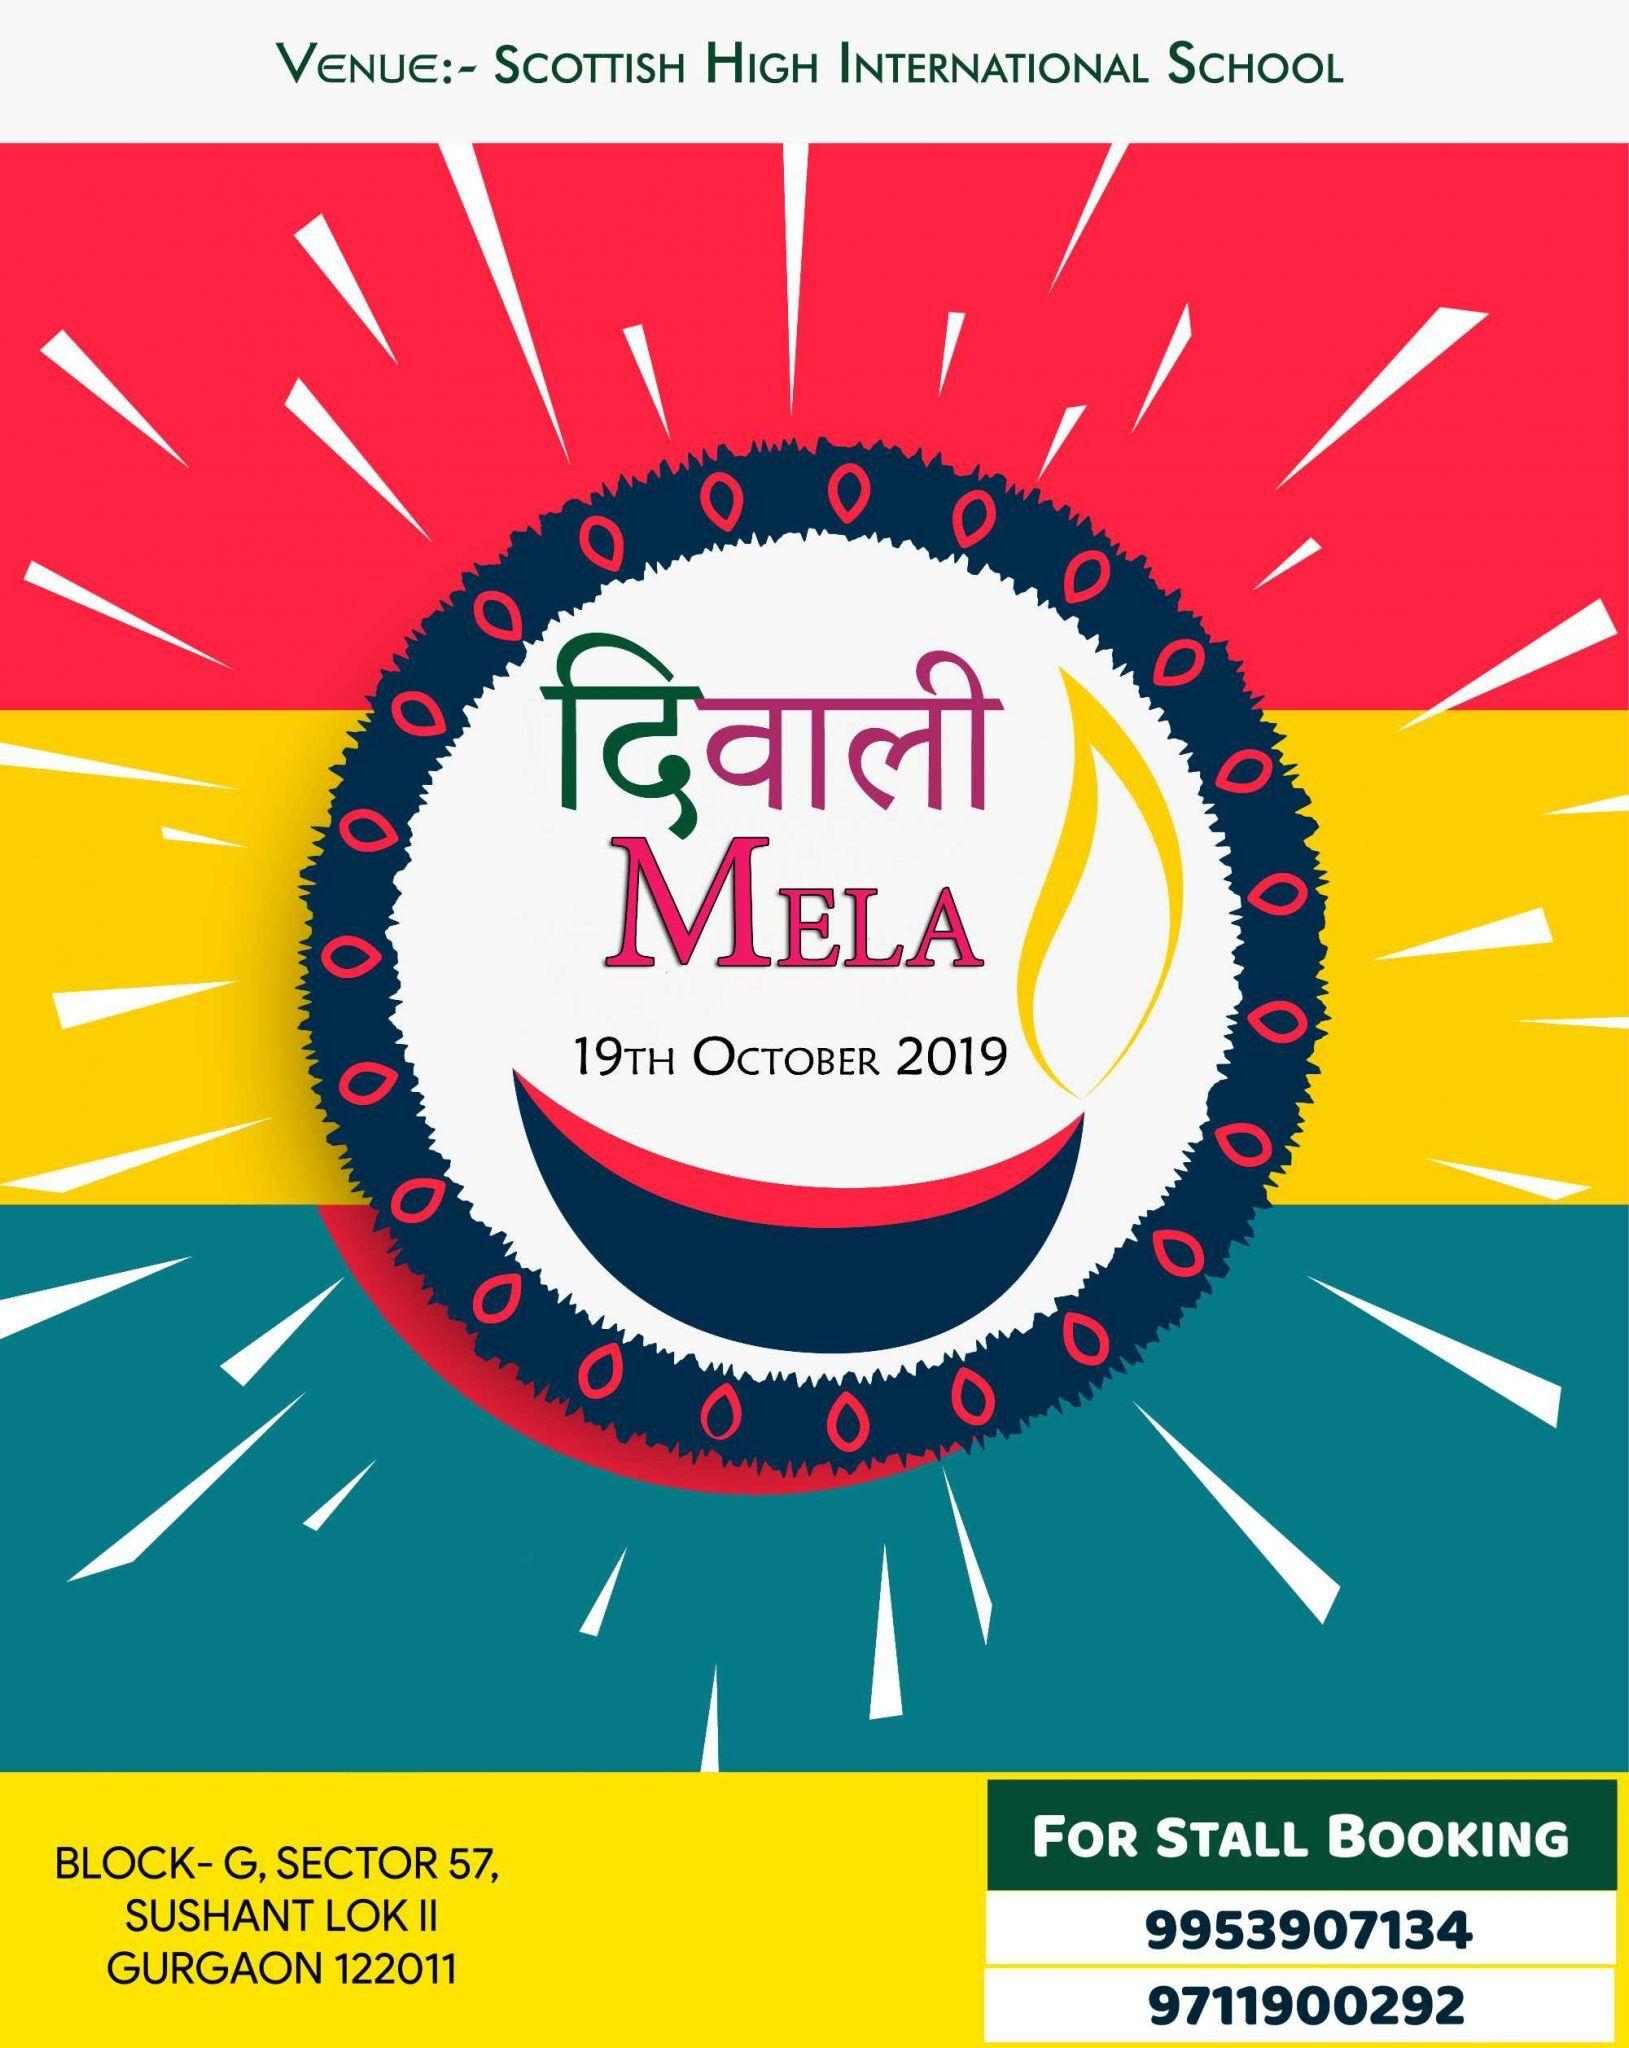 Diwali-Mela-2019-Gurgaon-Book-your-Stall-